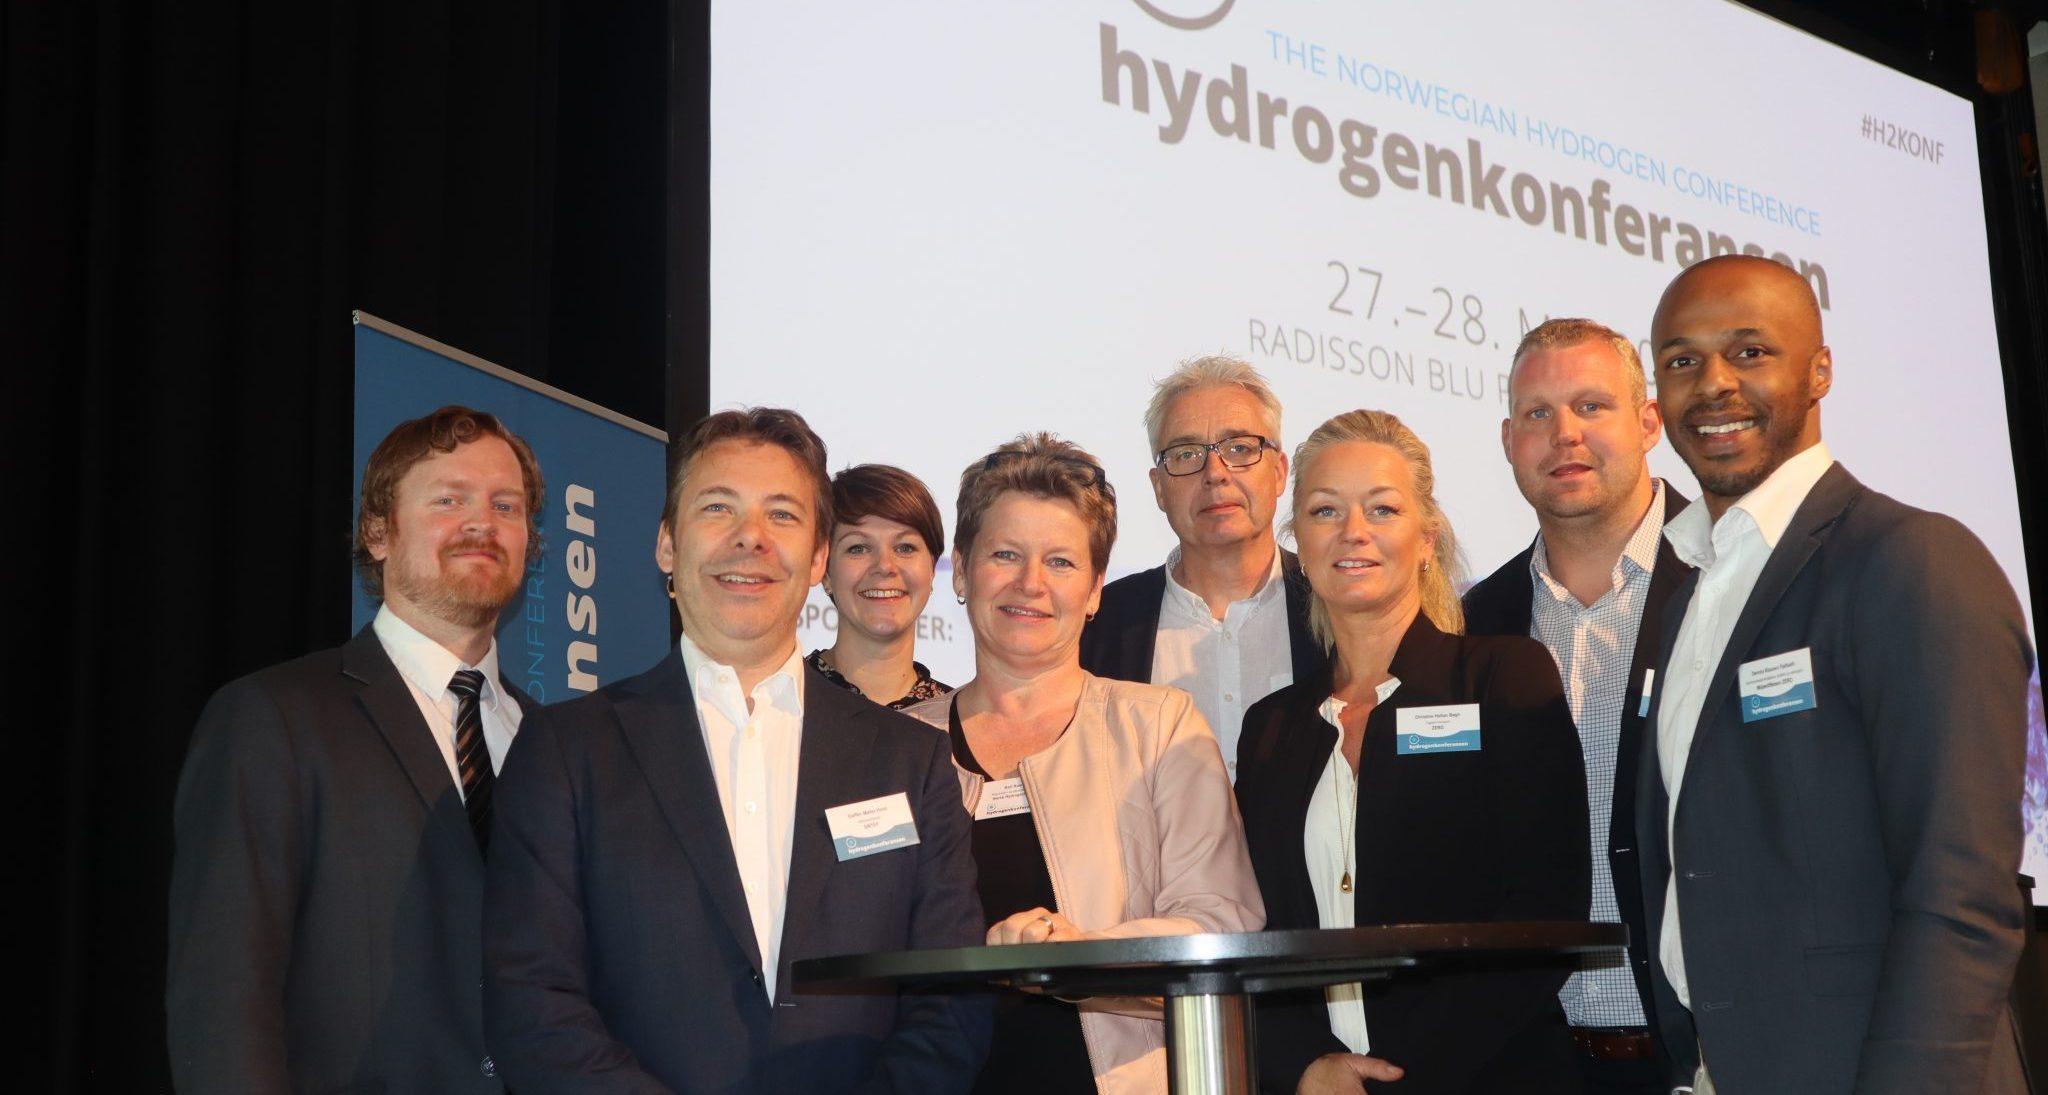 Hydrogenkonferansen 2019: – Utslippsfri hydrogen må bli lønnsomt